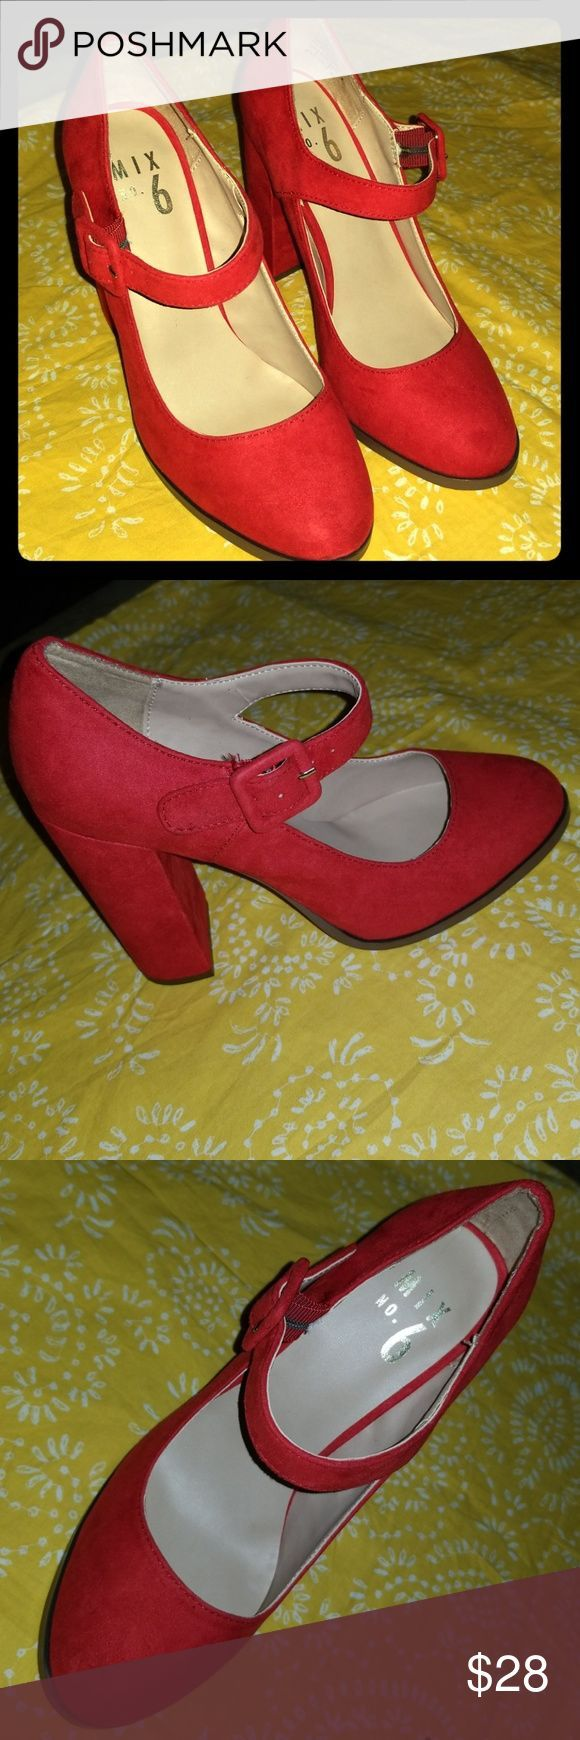 Red chunky heels Beautiful red chunky heels New Size 65 The heel is 3 inch  Red chunky heels Beautiful red chunky heels New Size 65 The heel is 3 inch